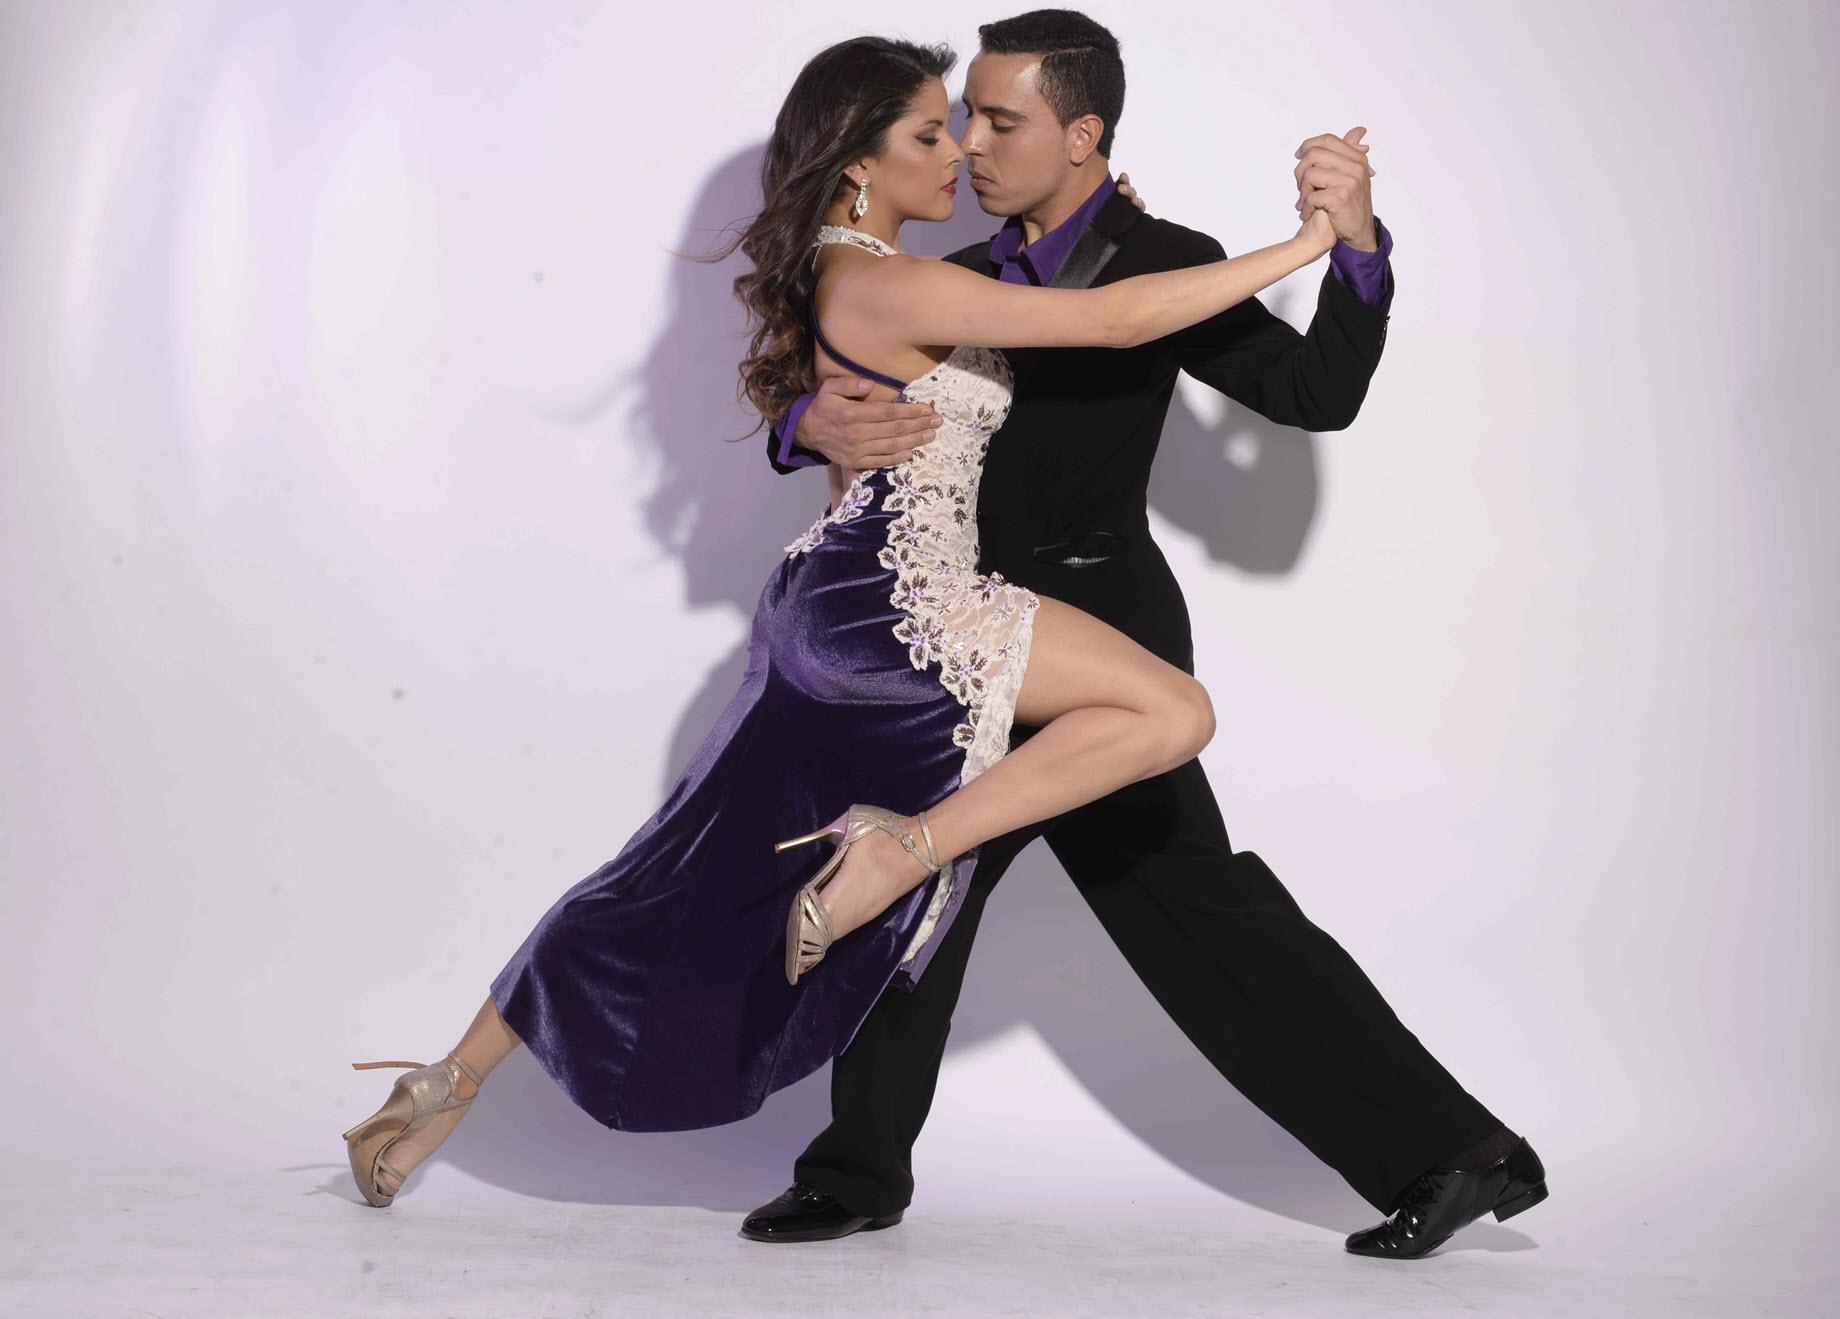 Natasha Arapé und Marcos Morinigo tanzen Tango Argentino